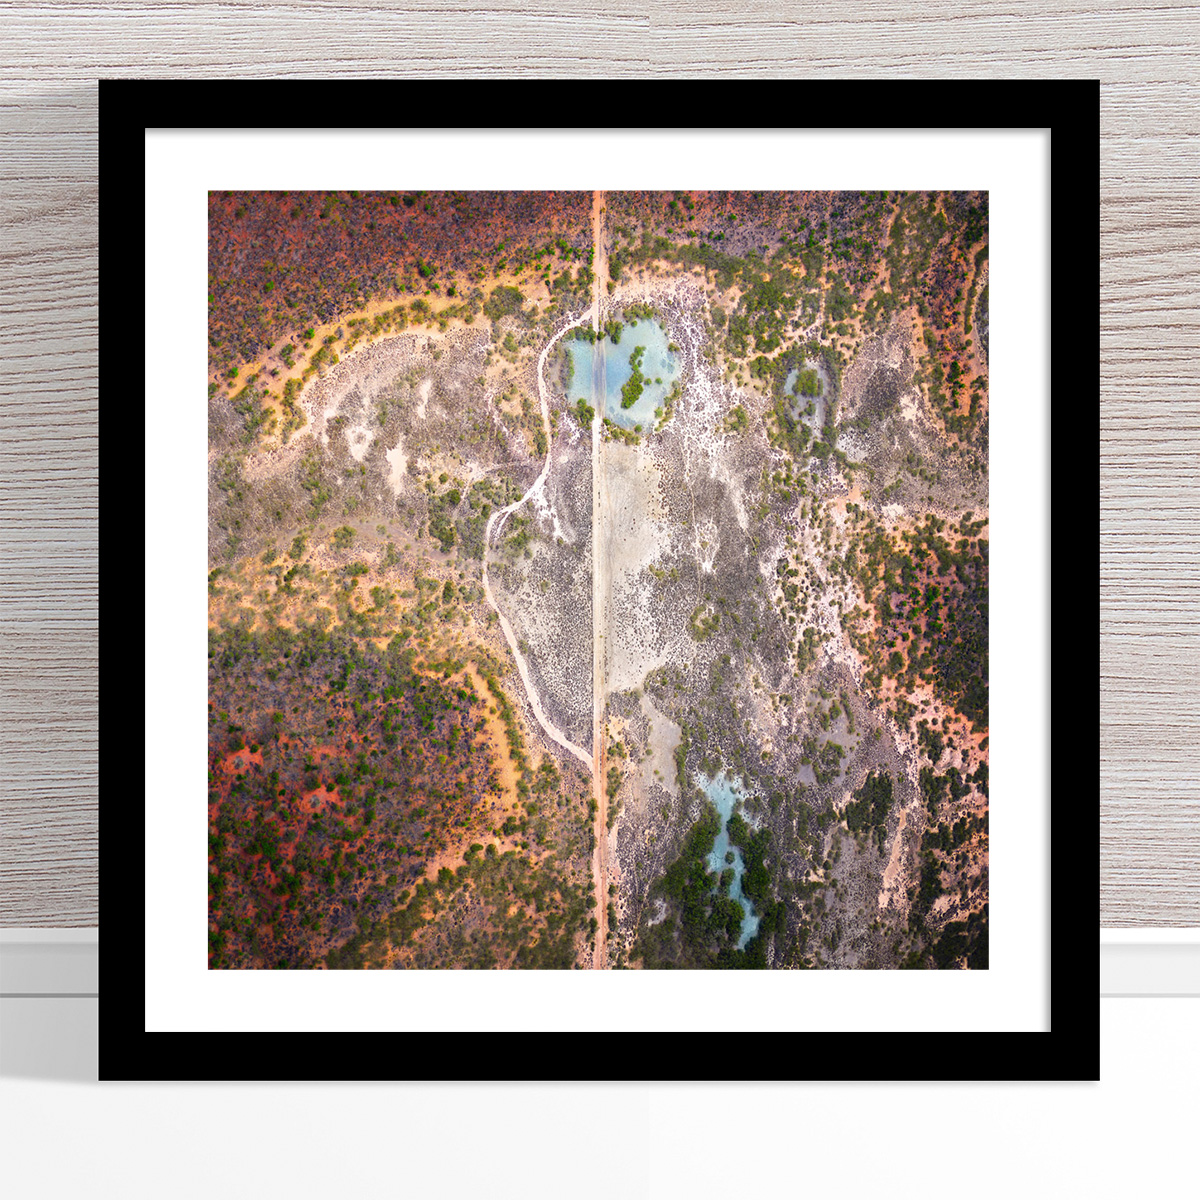 Chris Saunders - 'Aerial Outback 001' Black Frame